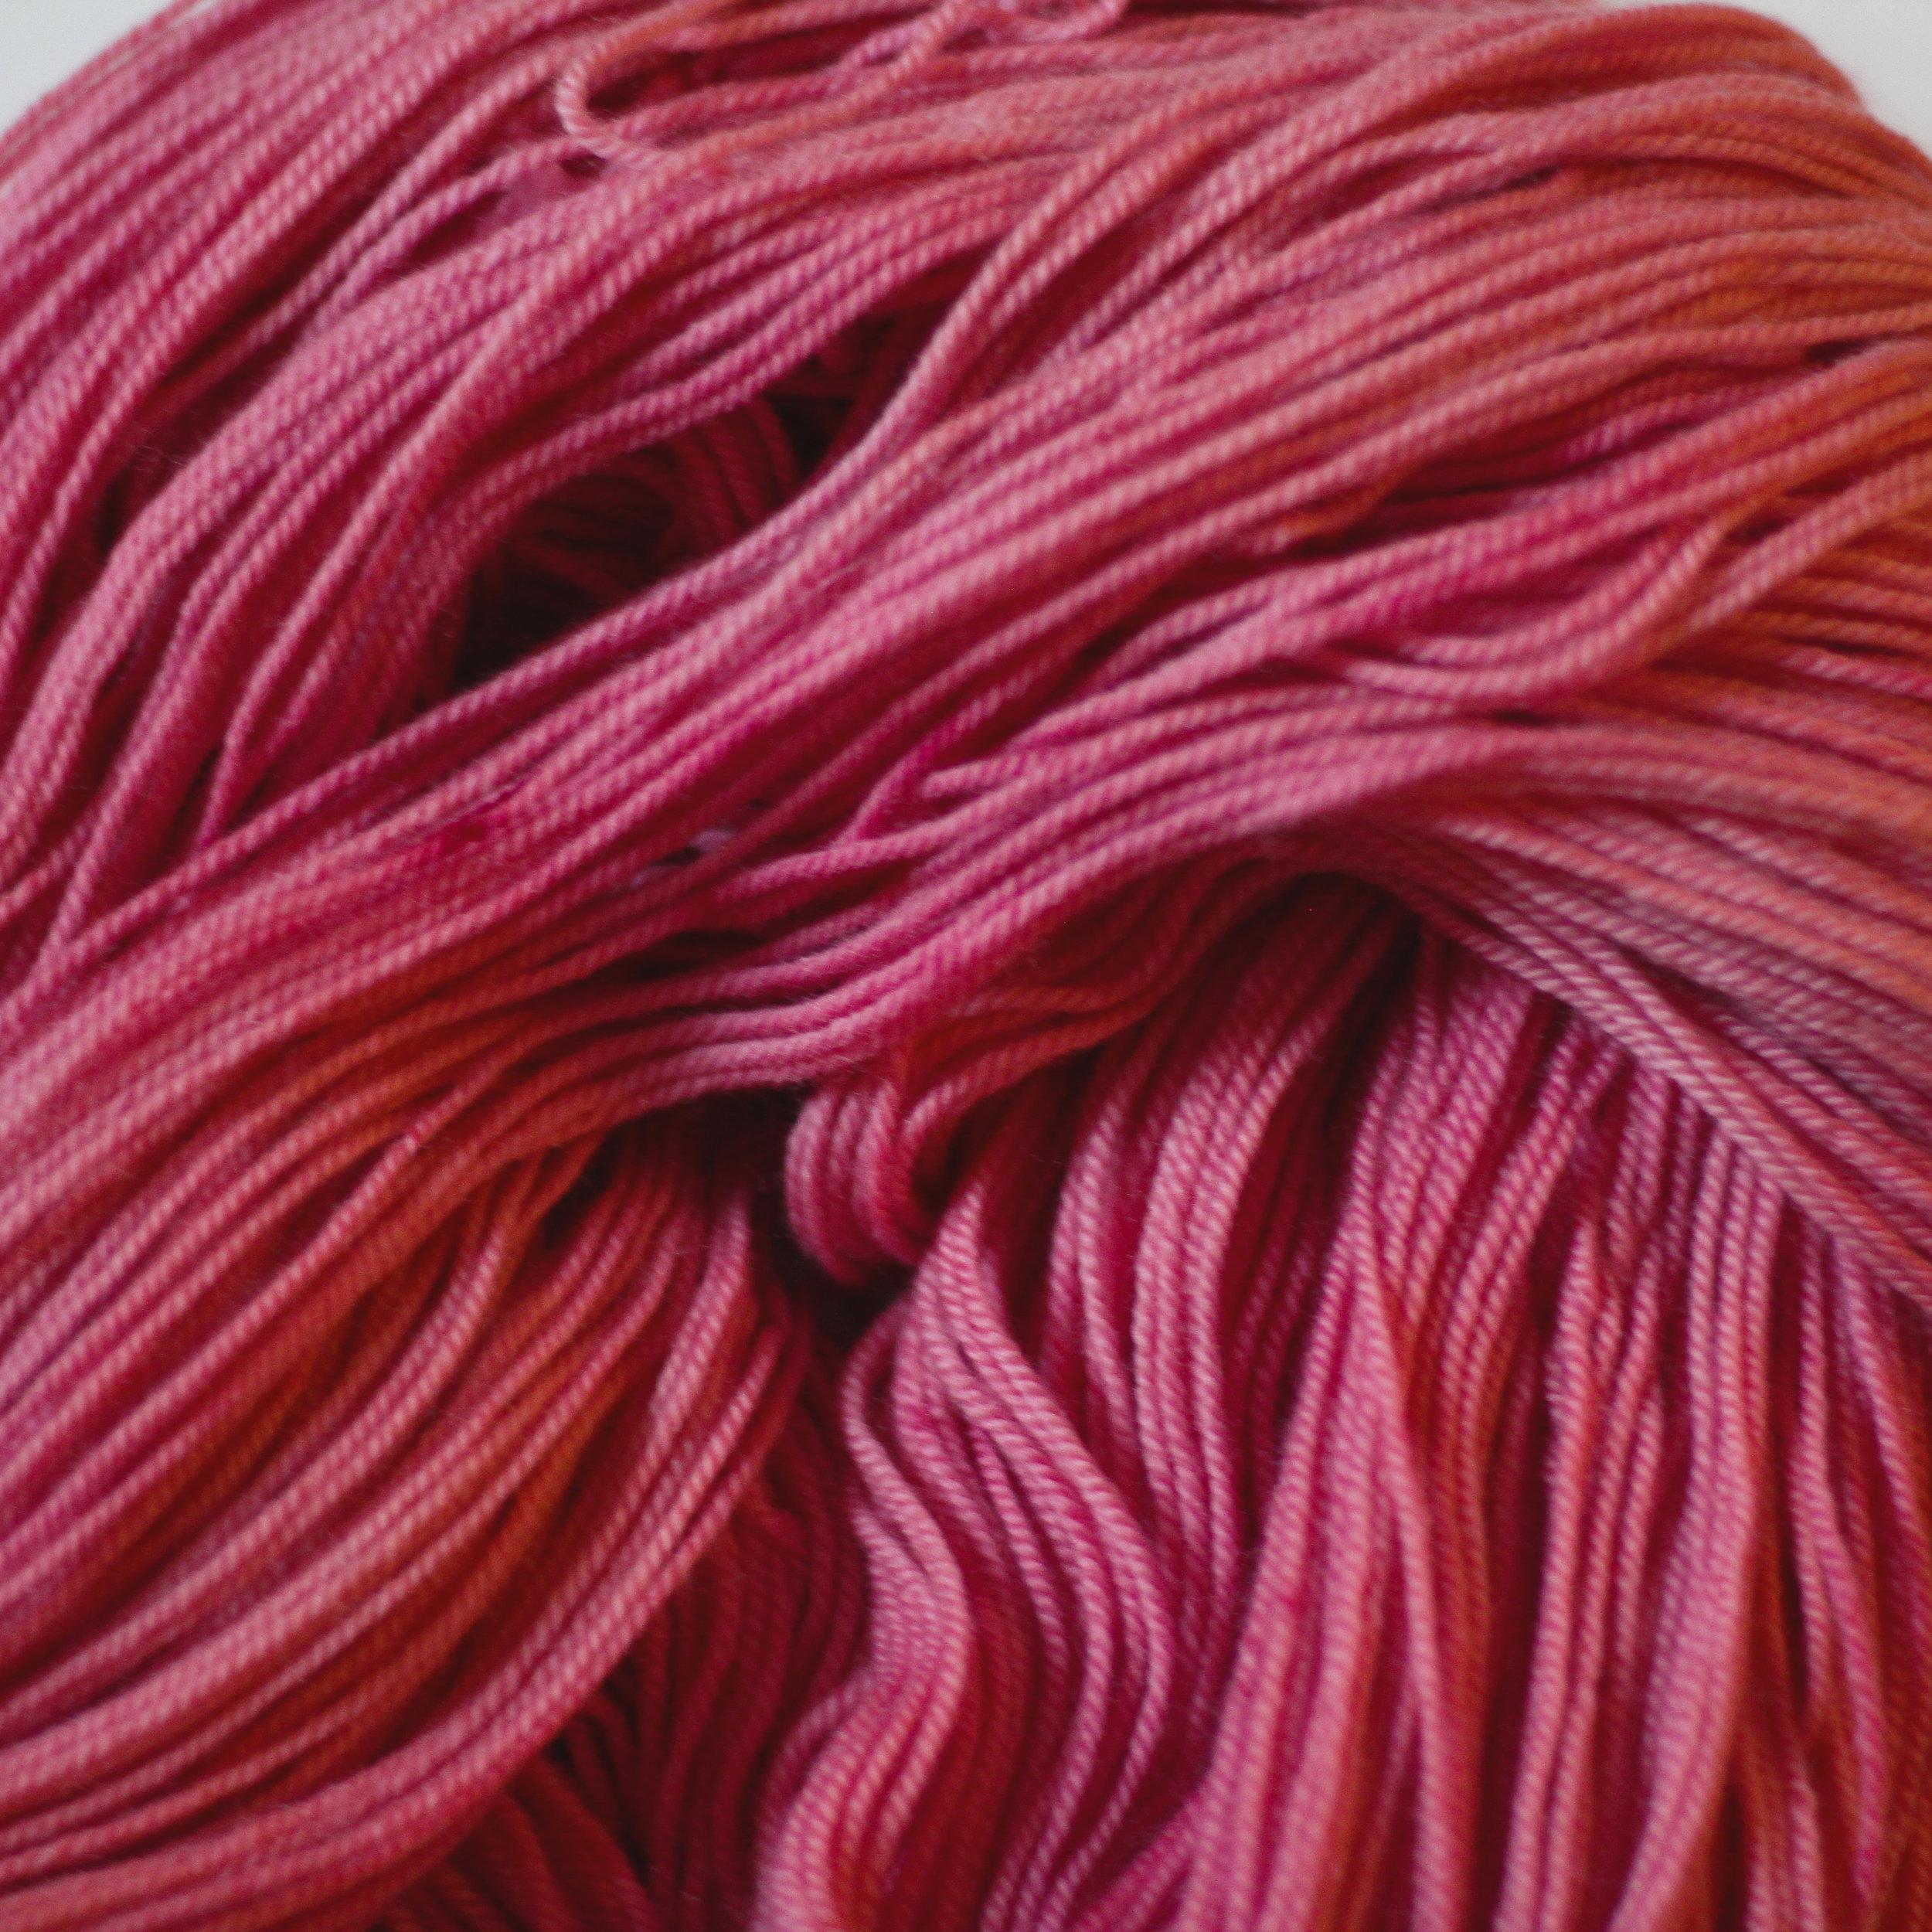 Sunburn     Cochineal   Dactylopius coccus   Logwood  Caesalpinia sappan